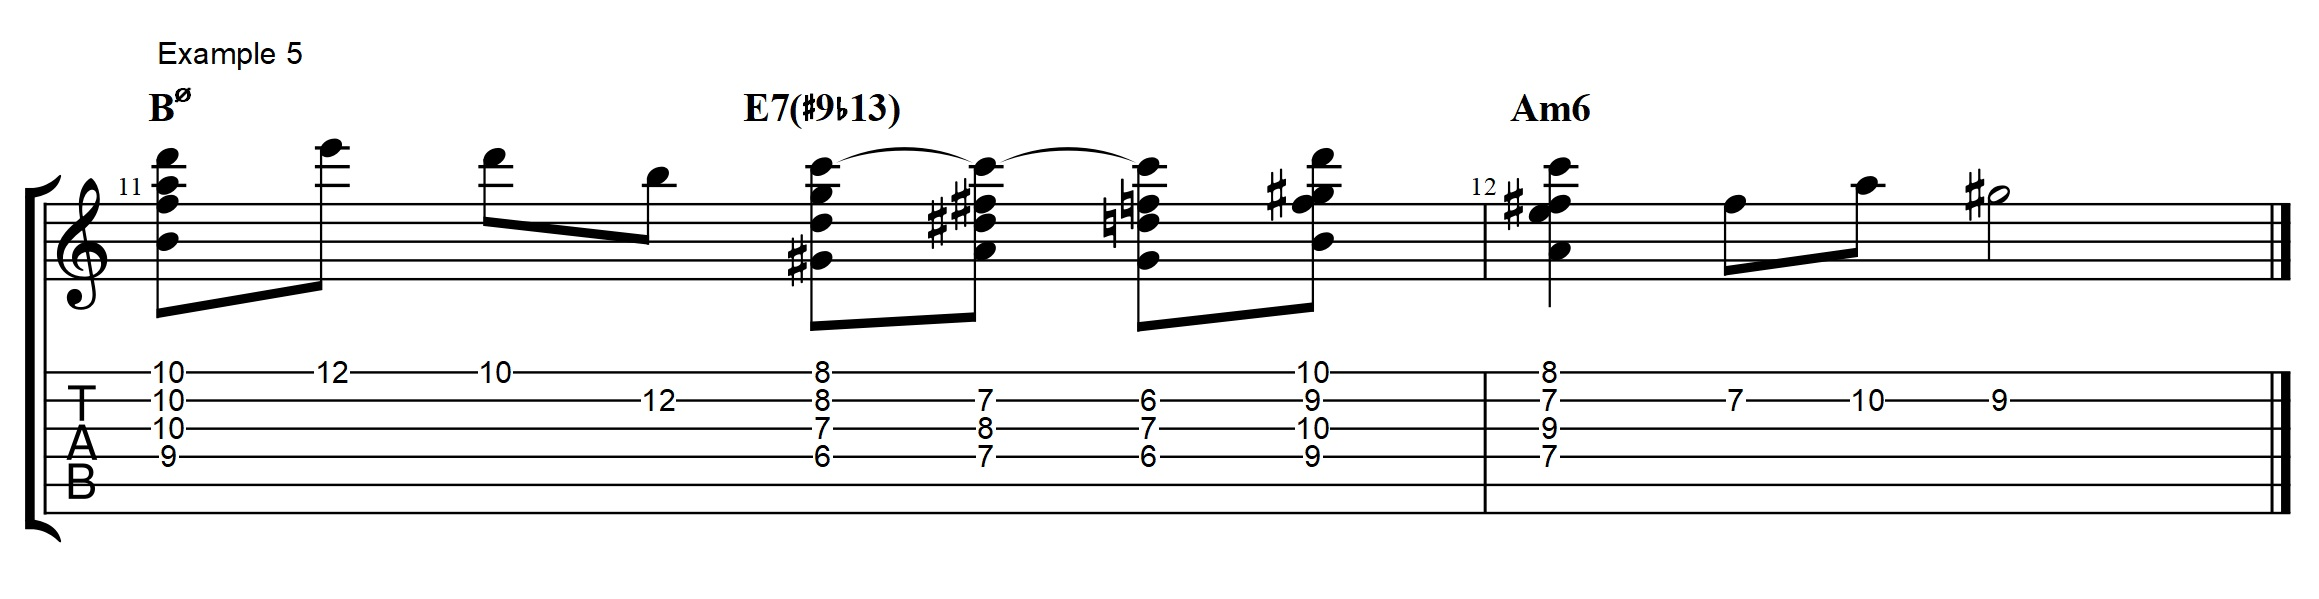 Drop2 Tactics To Create Cutting Edge Jazz Guitar Harmony Jens Larsen